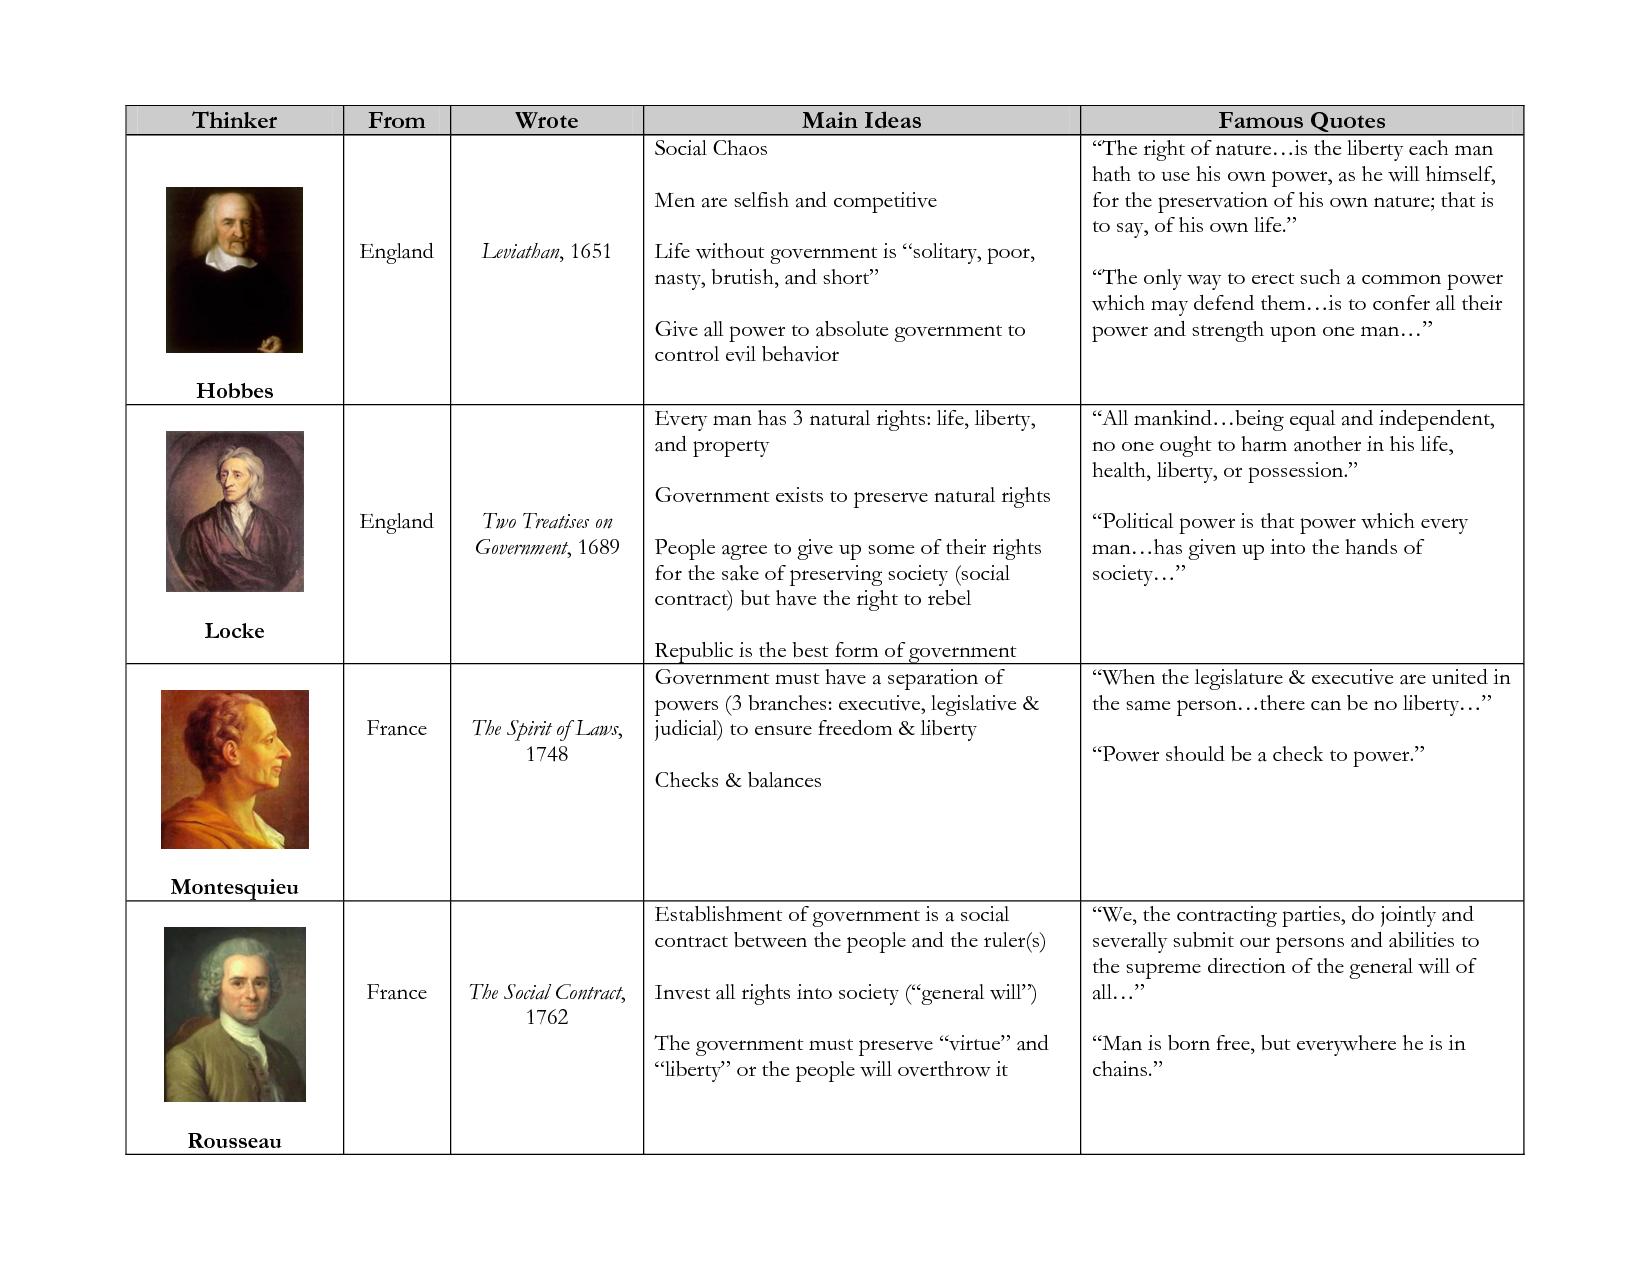 scientific revolution and enlightenment essay